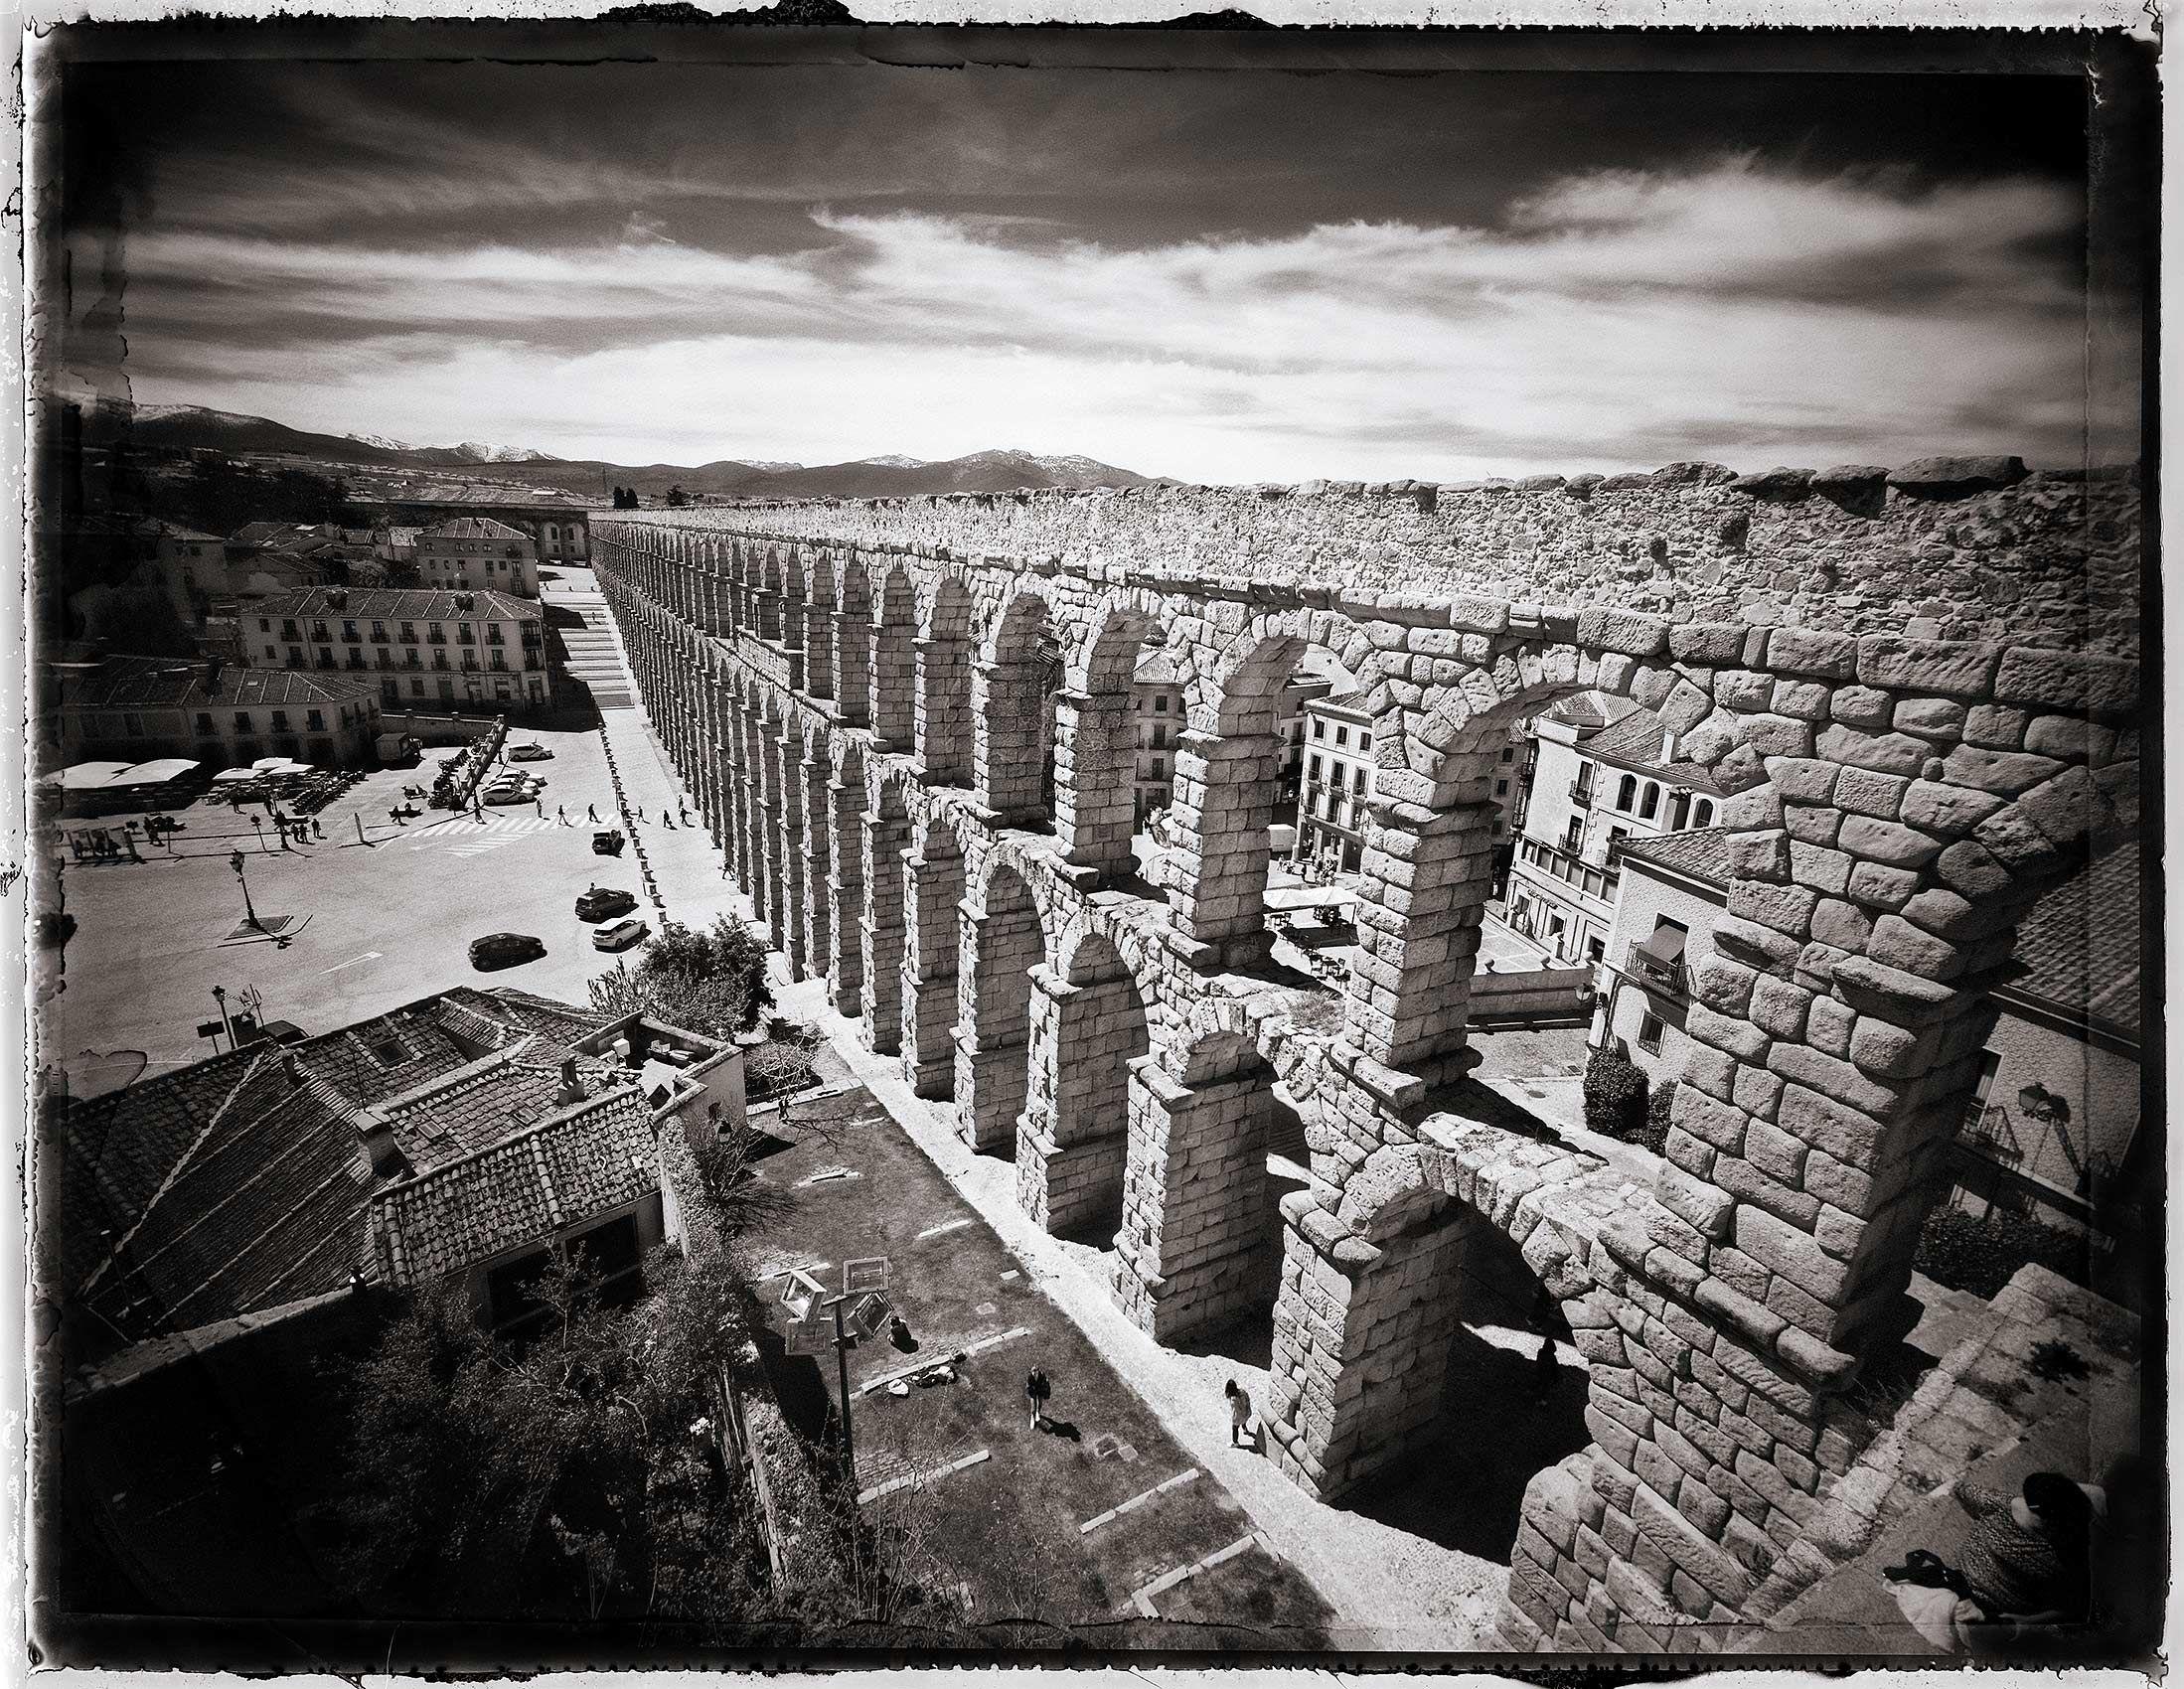 Aqueduct of Segovia #1